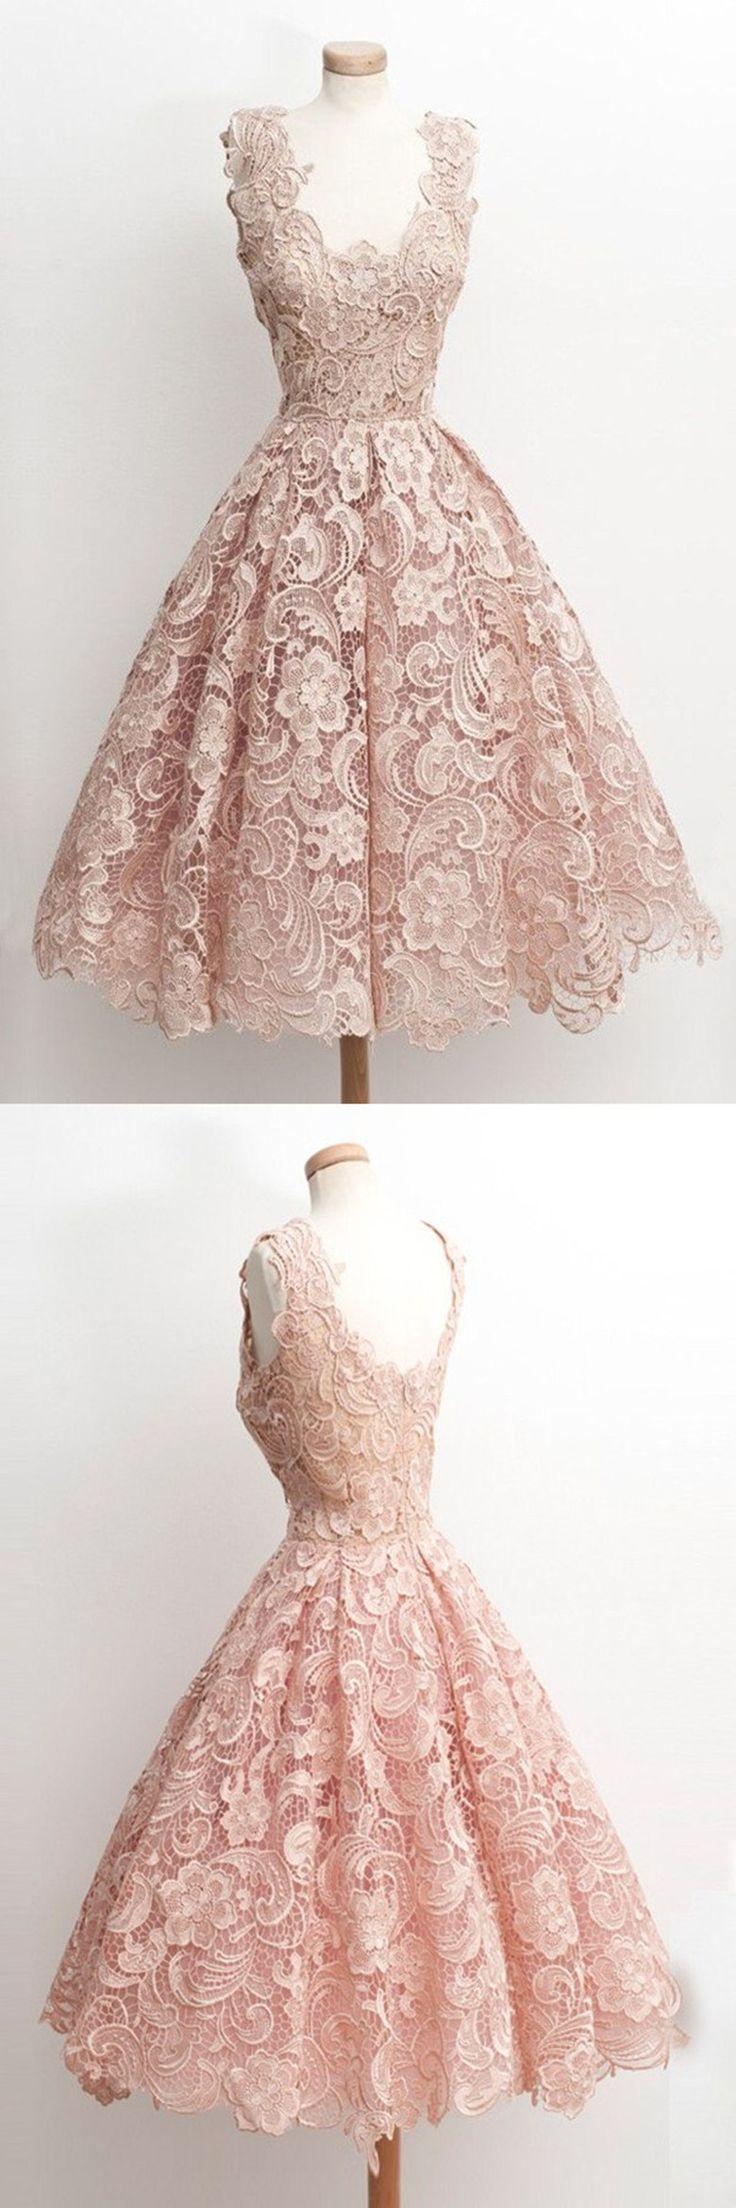 333 best Vintage Prom Dresses images on Pinterest | Ballroom dress ...